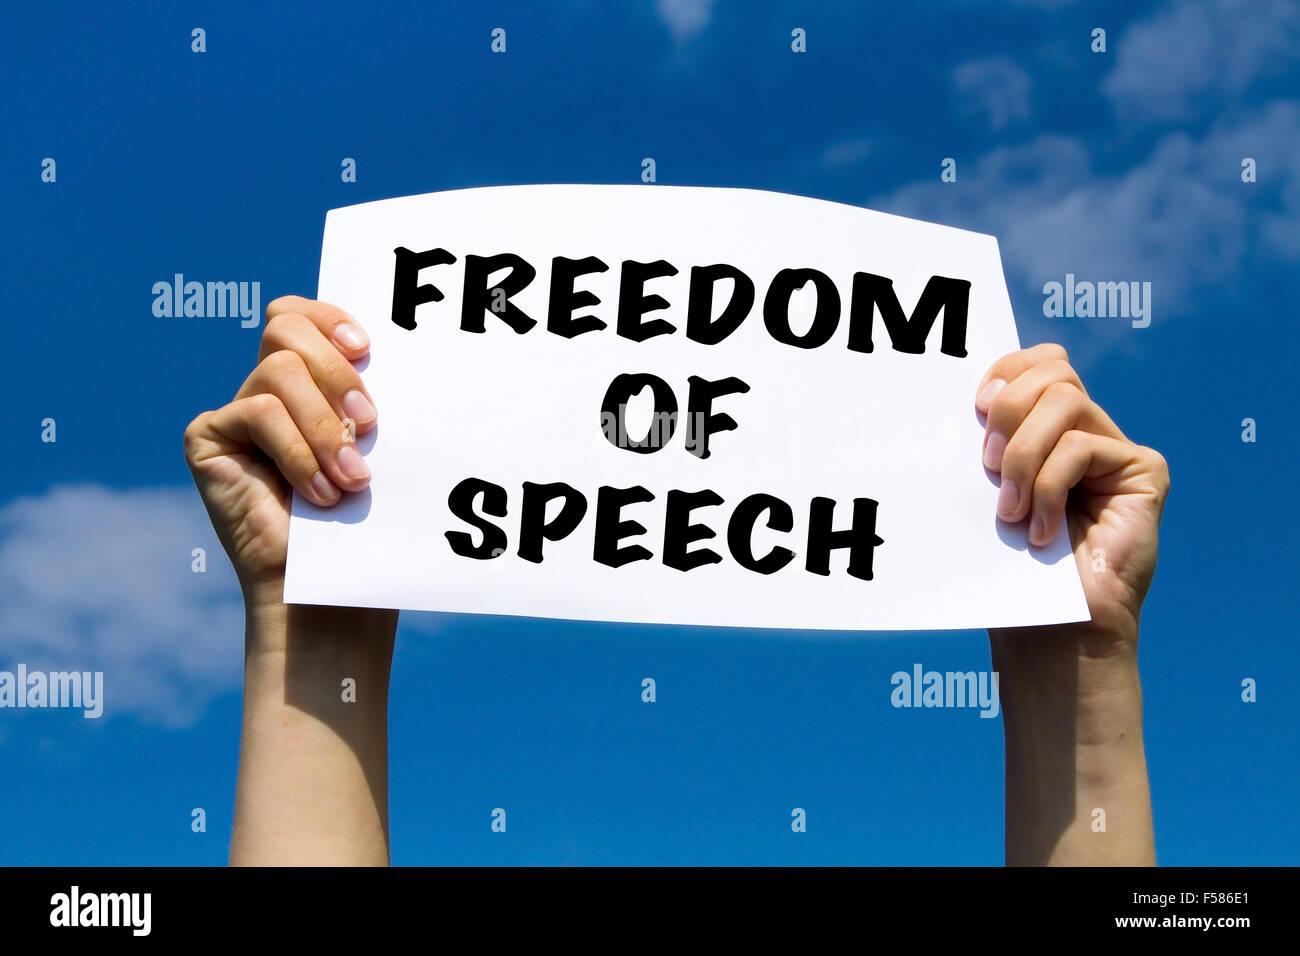 freedom of speech concept - Stock Image